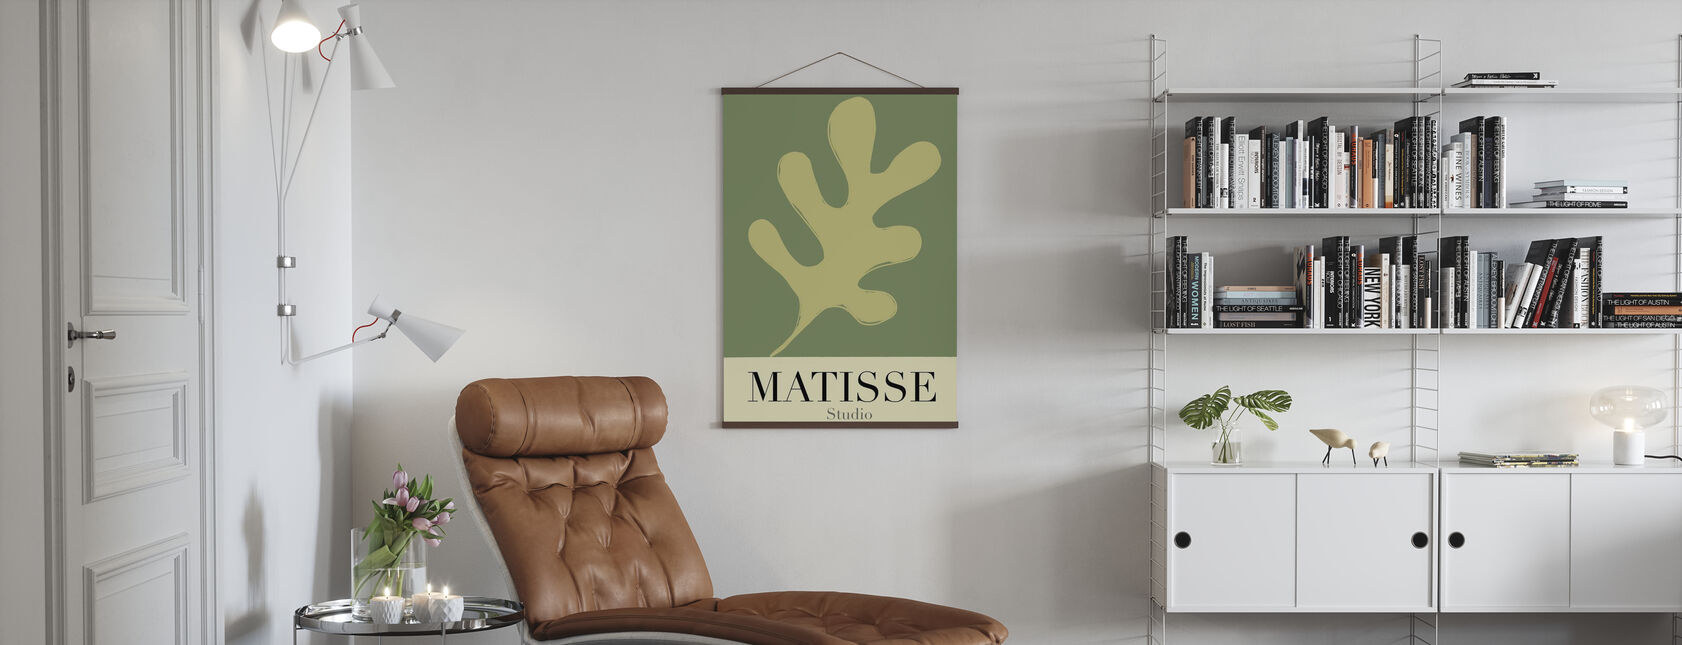 Matisse Studio - Plakat - Stue